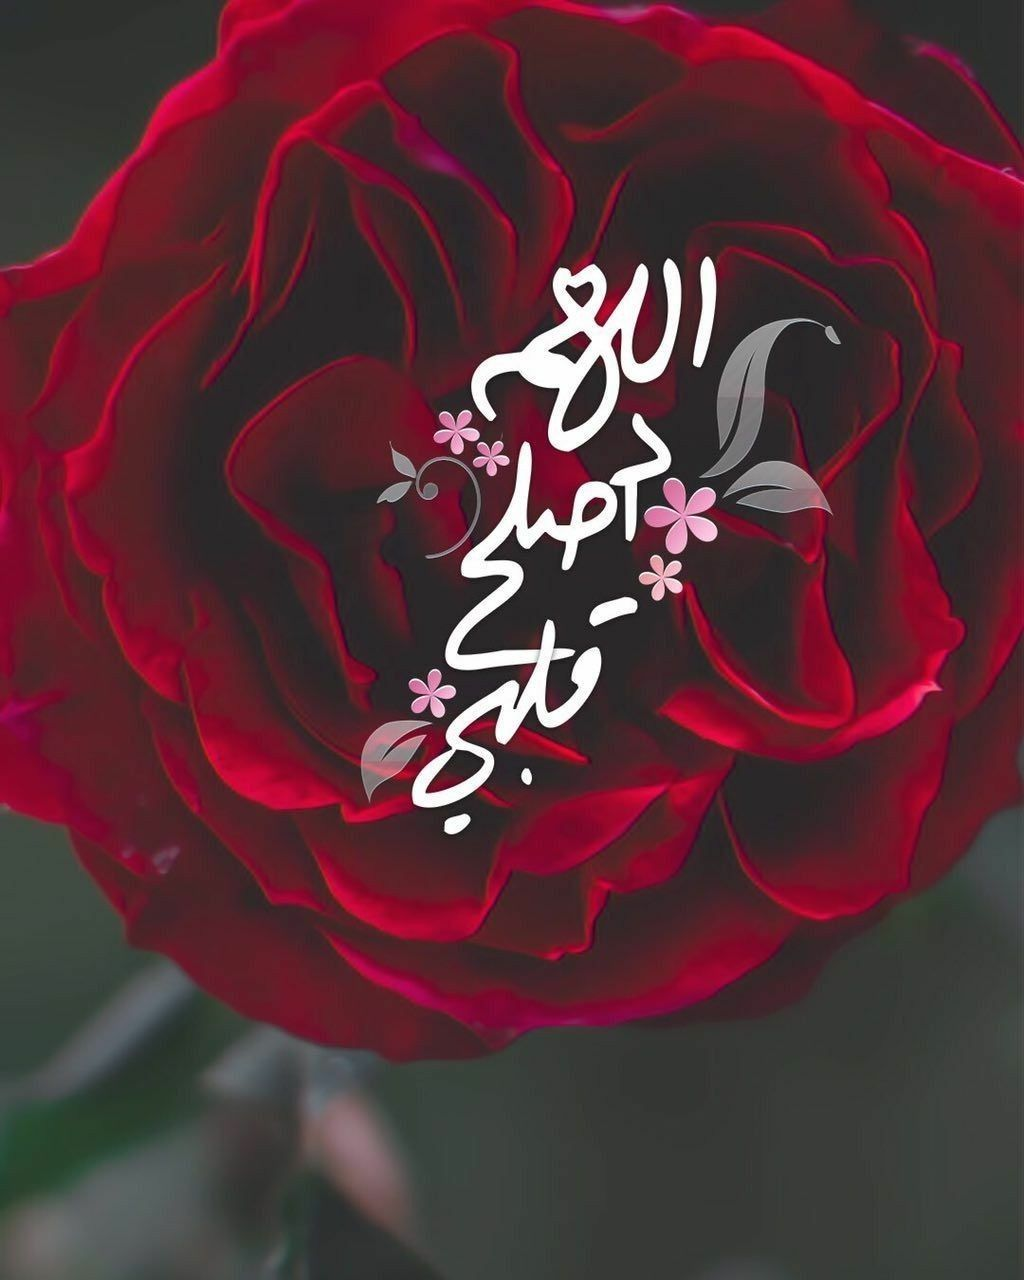 Pin By زهرة الياسمين On Duea دعاء Neon Signs Neon Islam